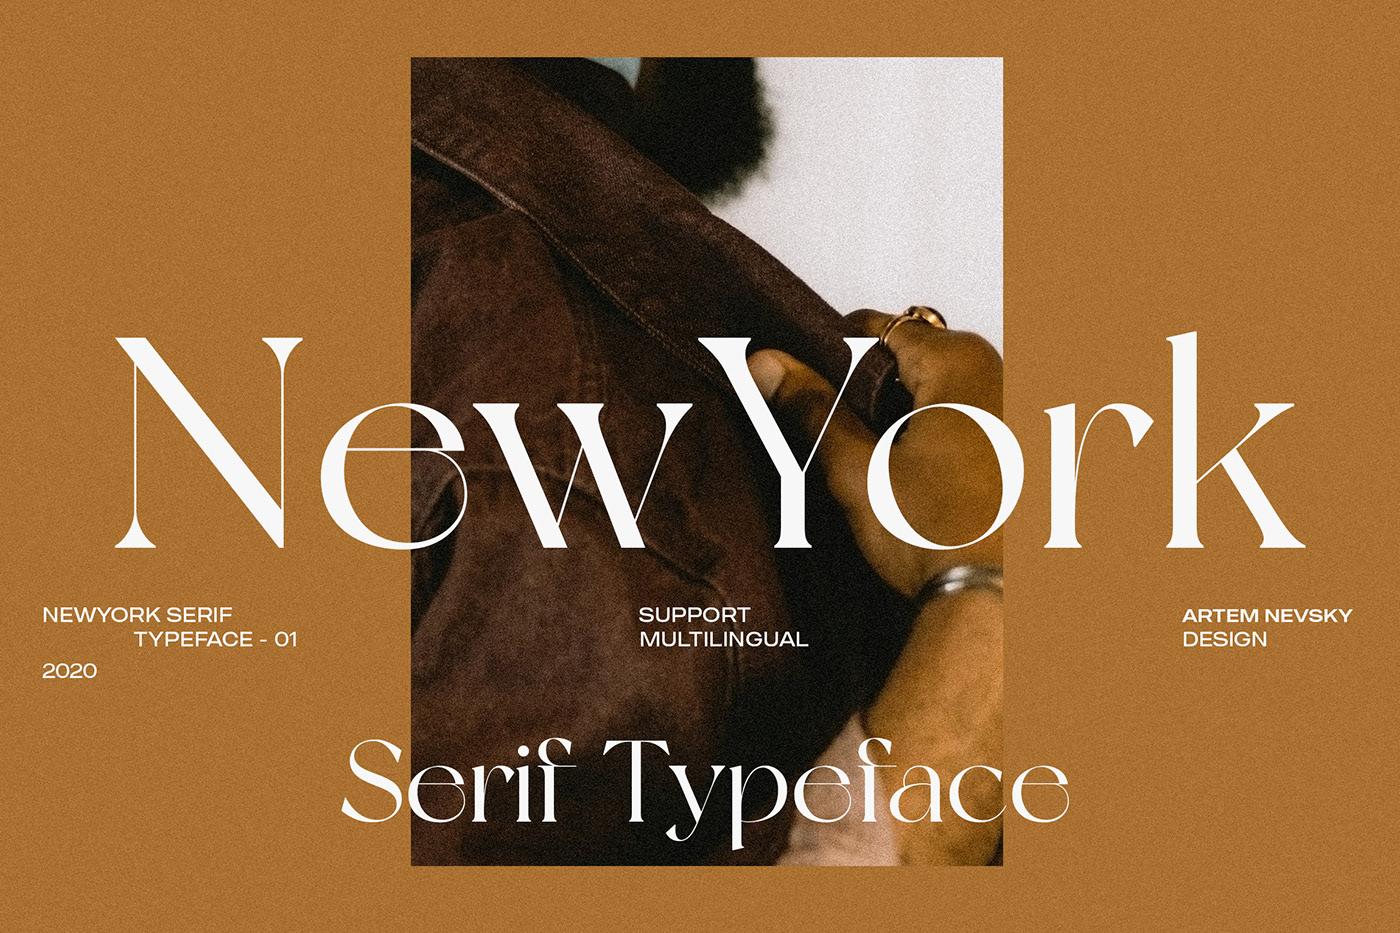 New York Modern Serif Typeface